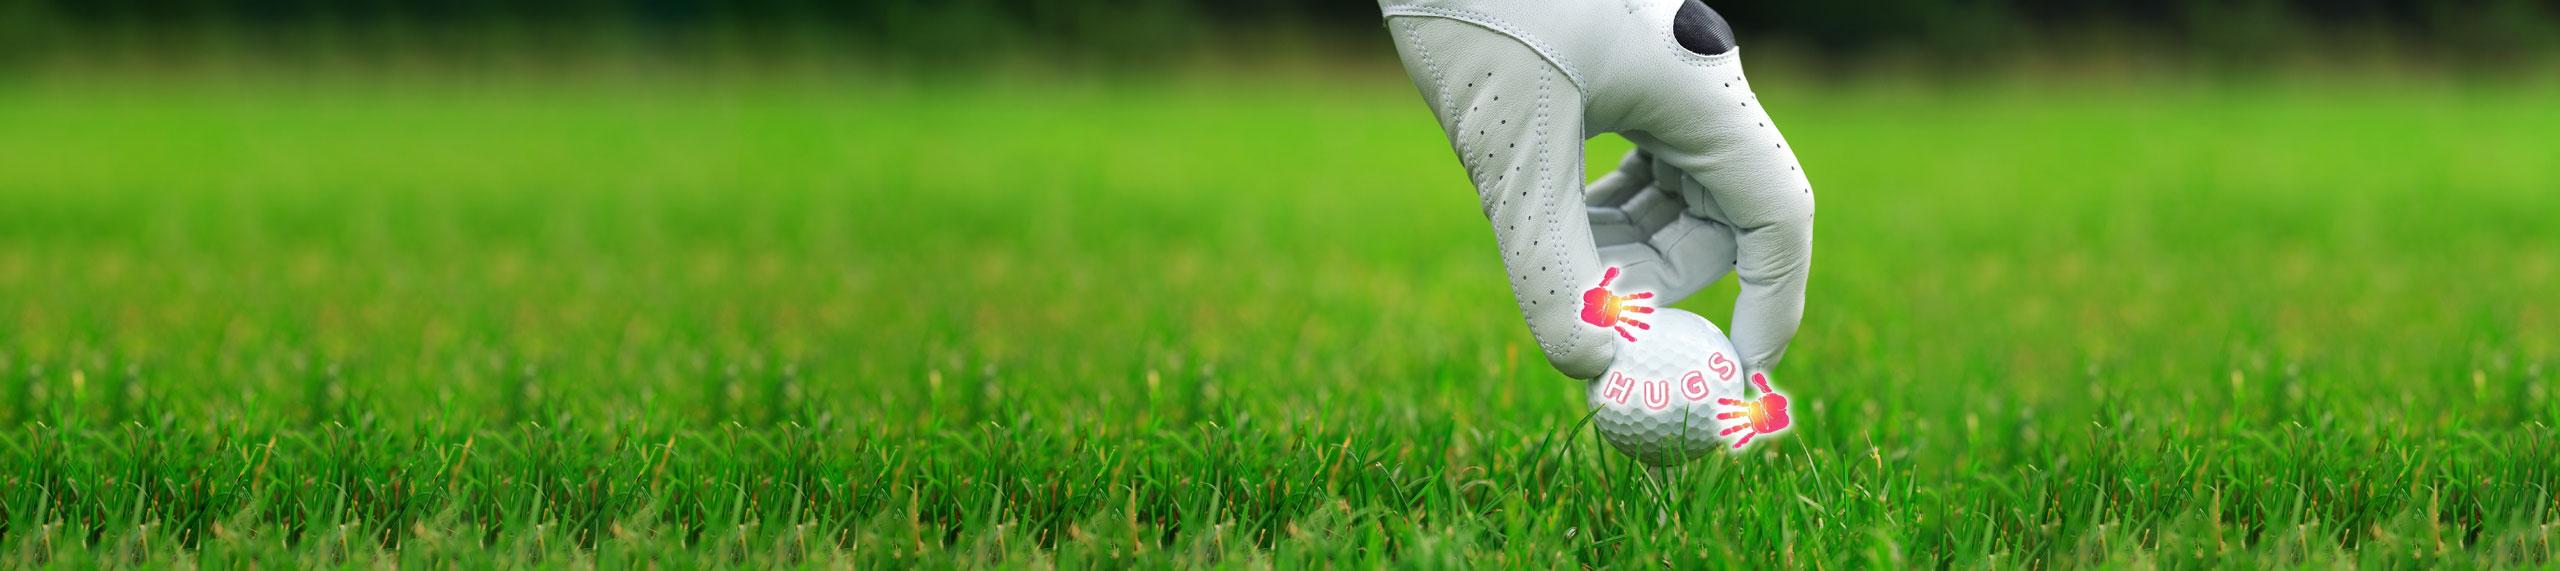 Hugs Golf Fund Raiser 2020